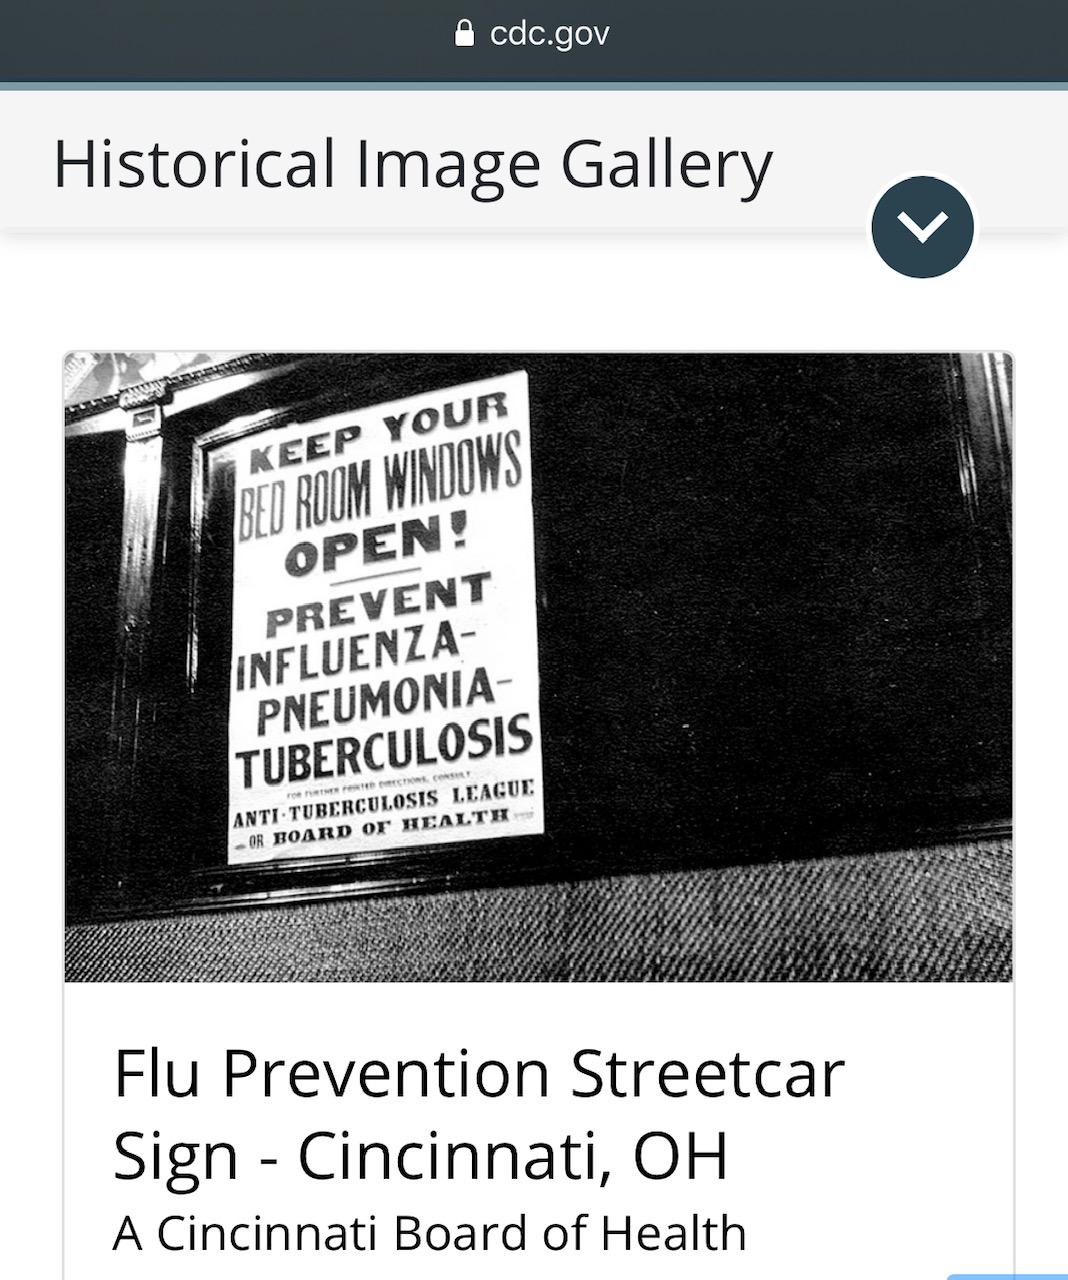 CDC photos on epidemic